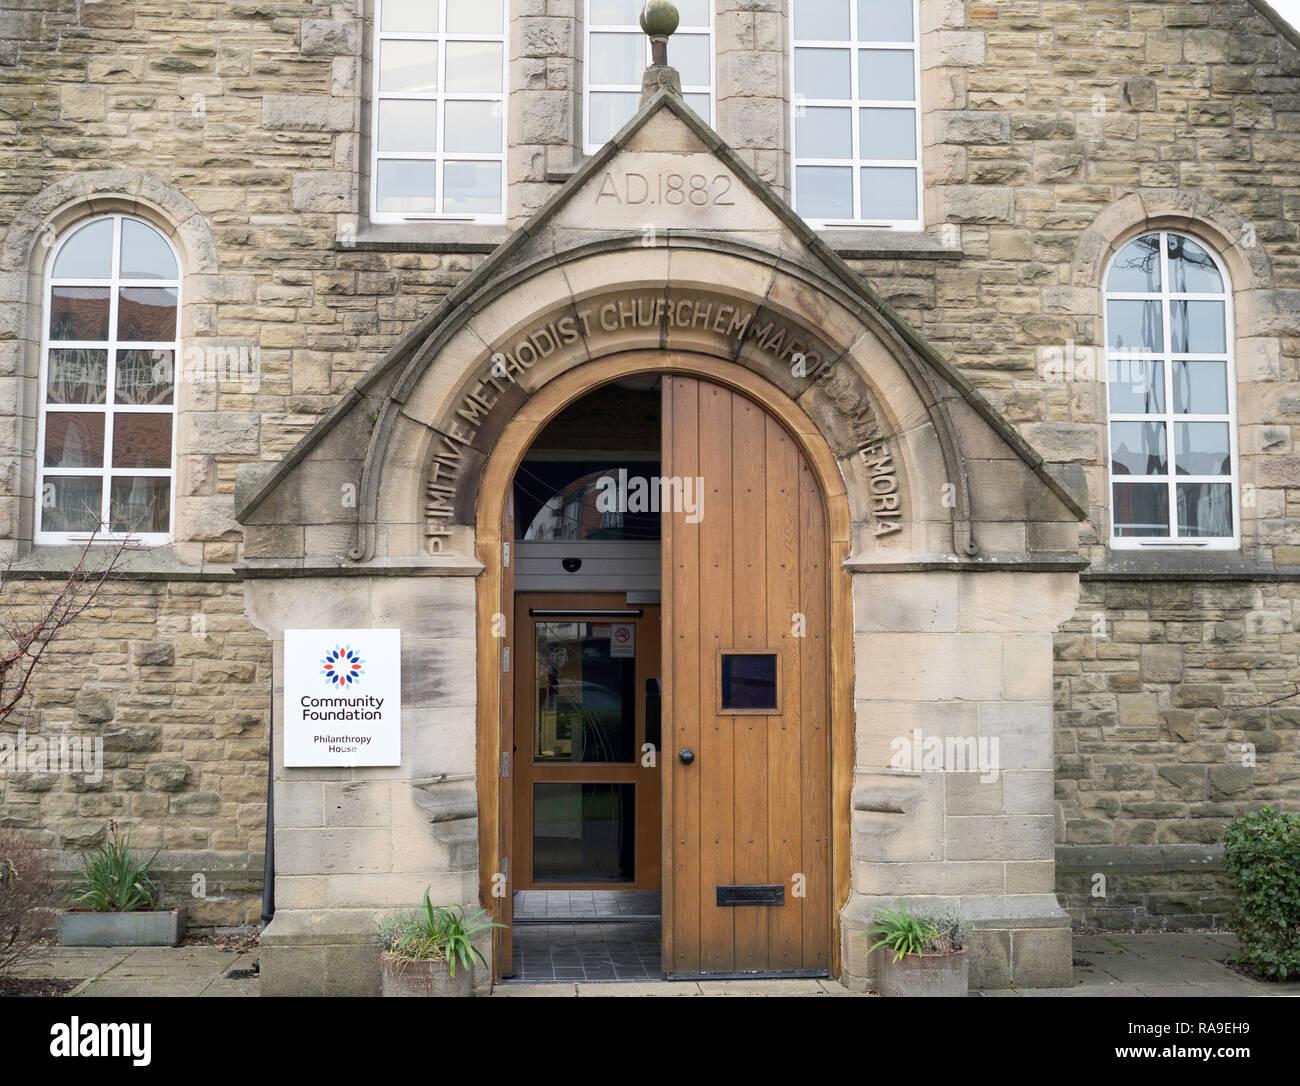 Community Foundation building,  Philanthropy House, in Gosforth, Newcastle, north east England, UK Stock Photo